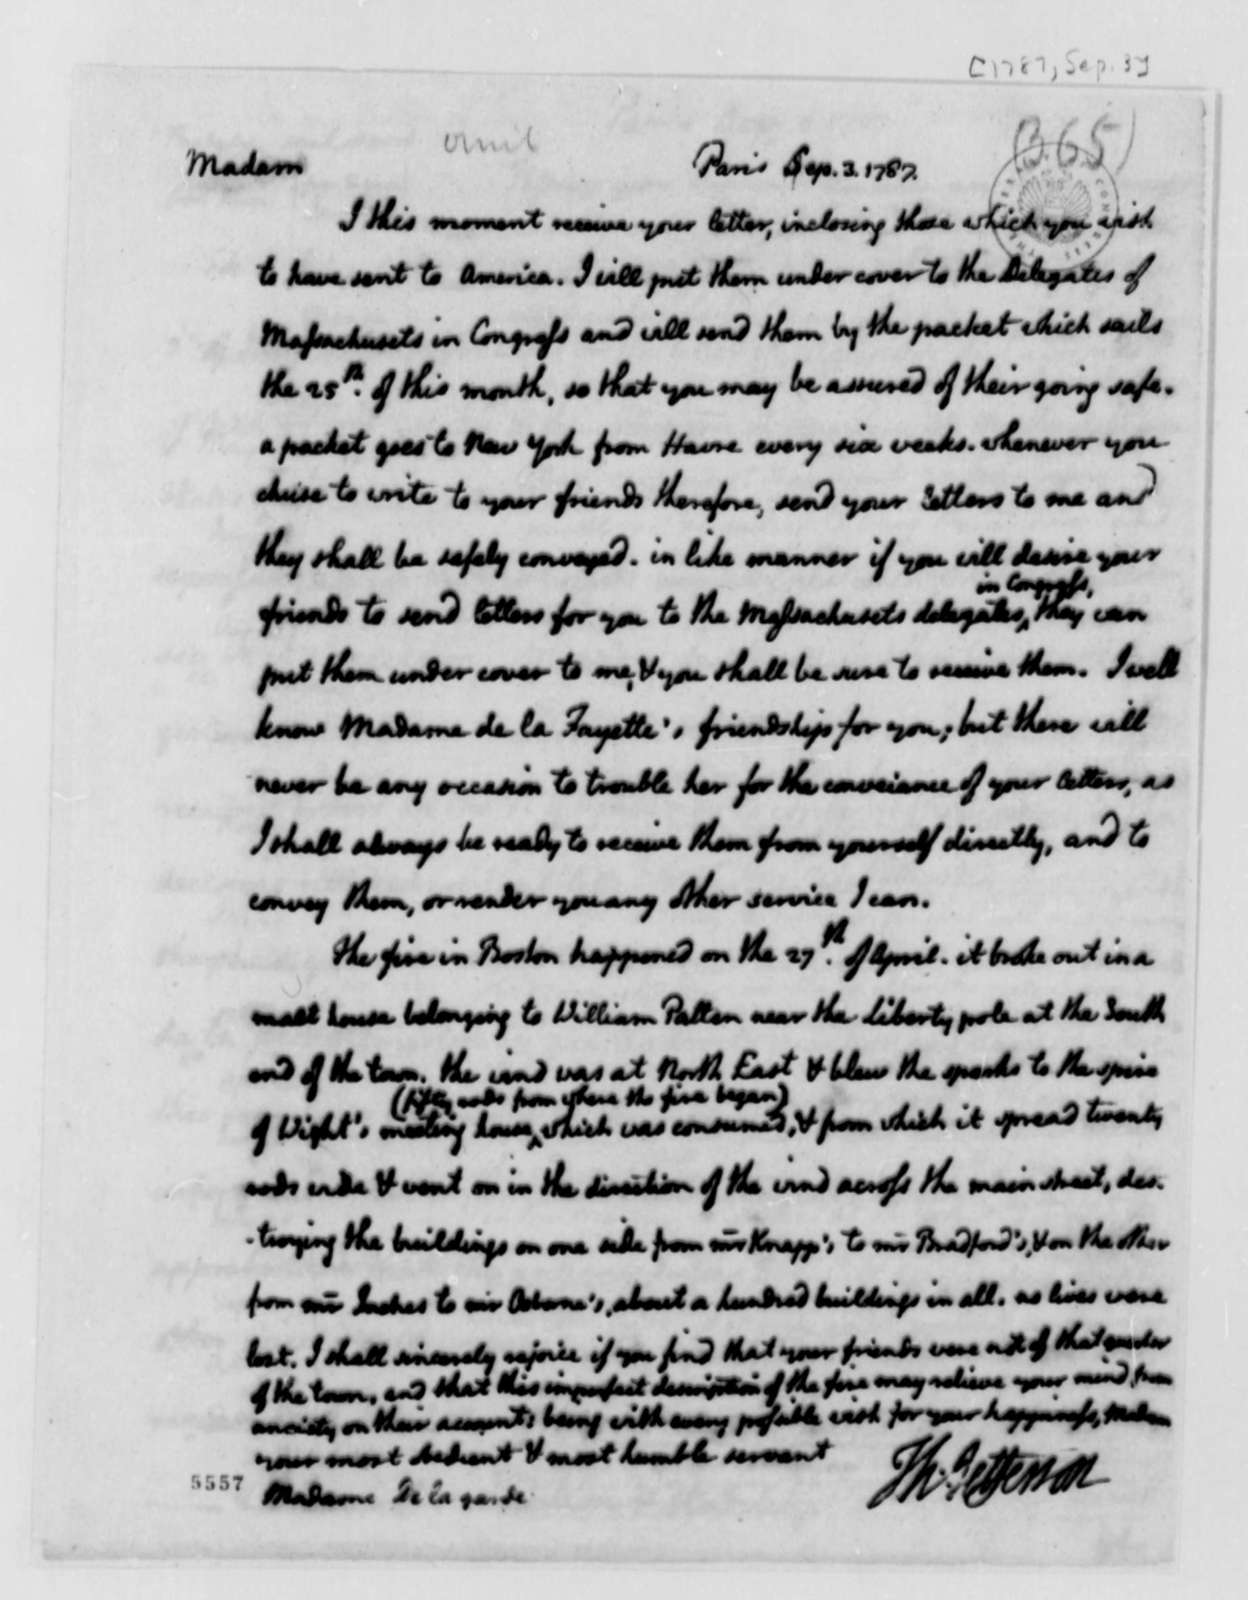 Thomas Jefferson to Fanny Delagarde, September 3, 1787